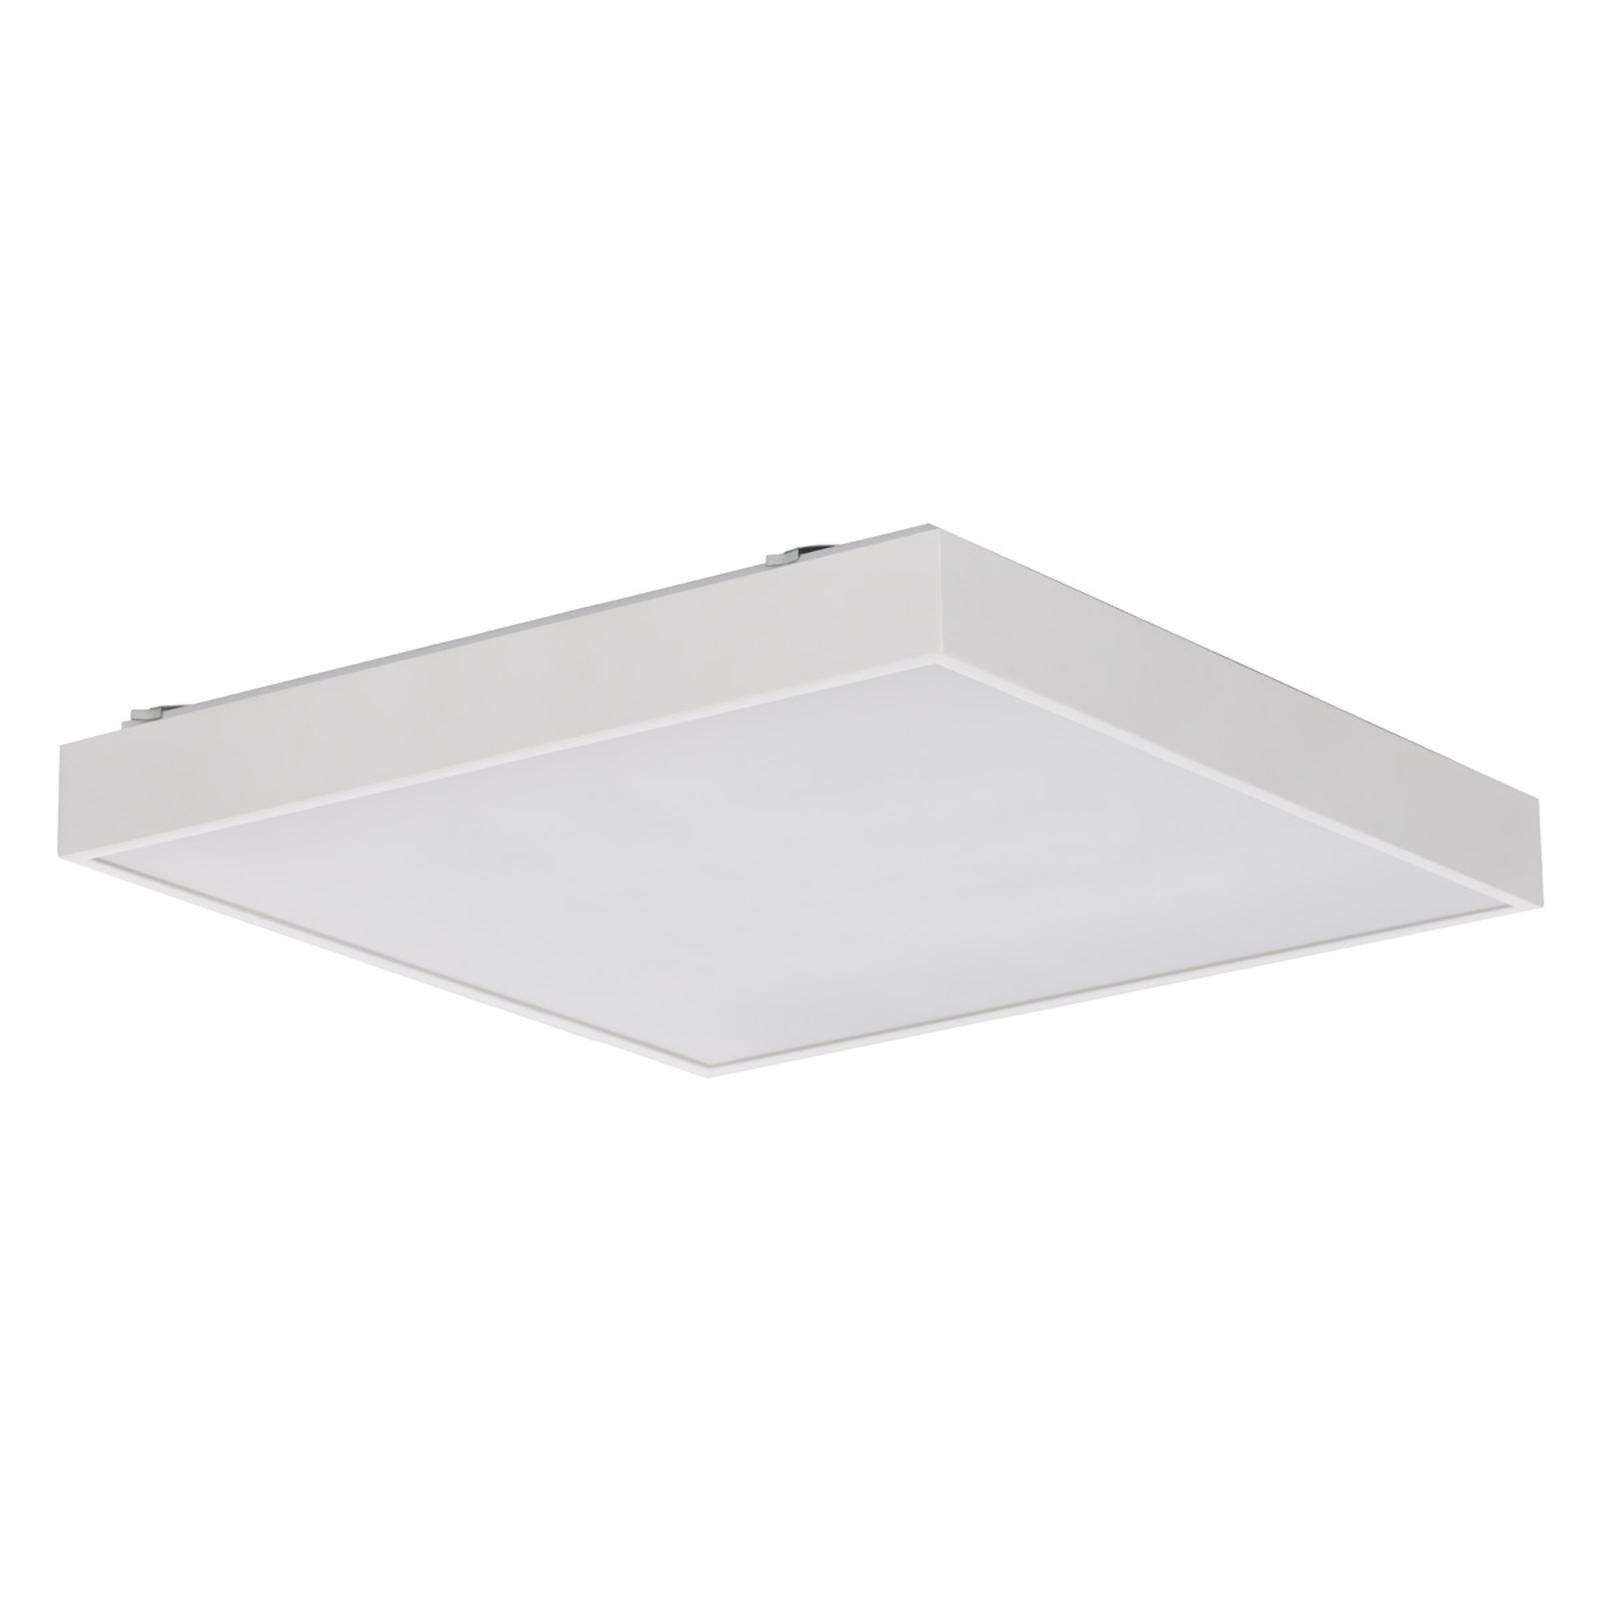 Oszczędna lampa sufitowa Q6 biała DALI